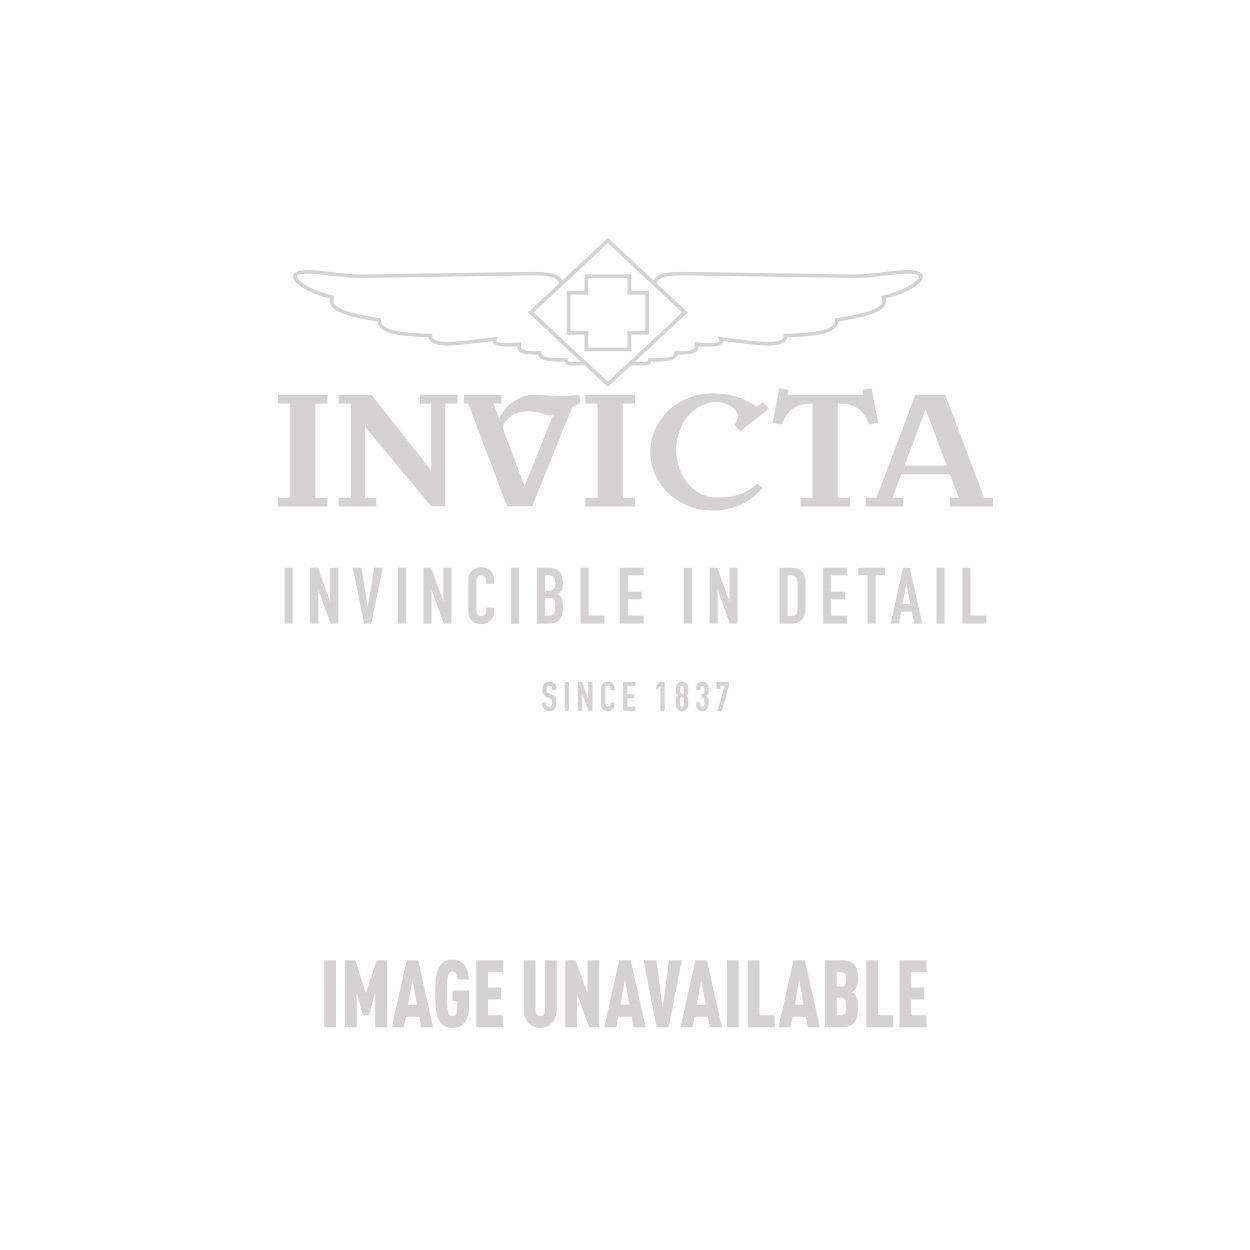 INVICTA Jewelry Incanto Necklaces 105 54.3 Silver 925 and Ceramic Black+Yellow Gold+Platinum - Model J0063